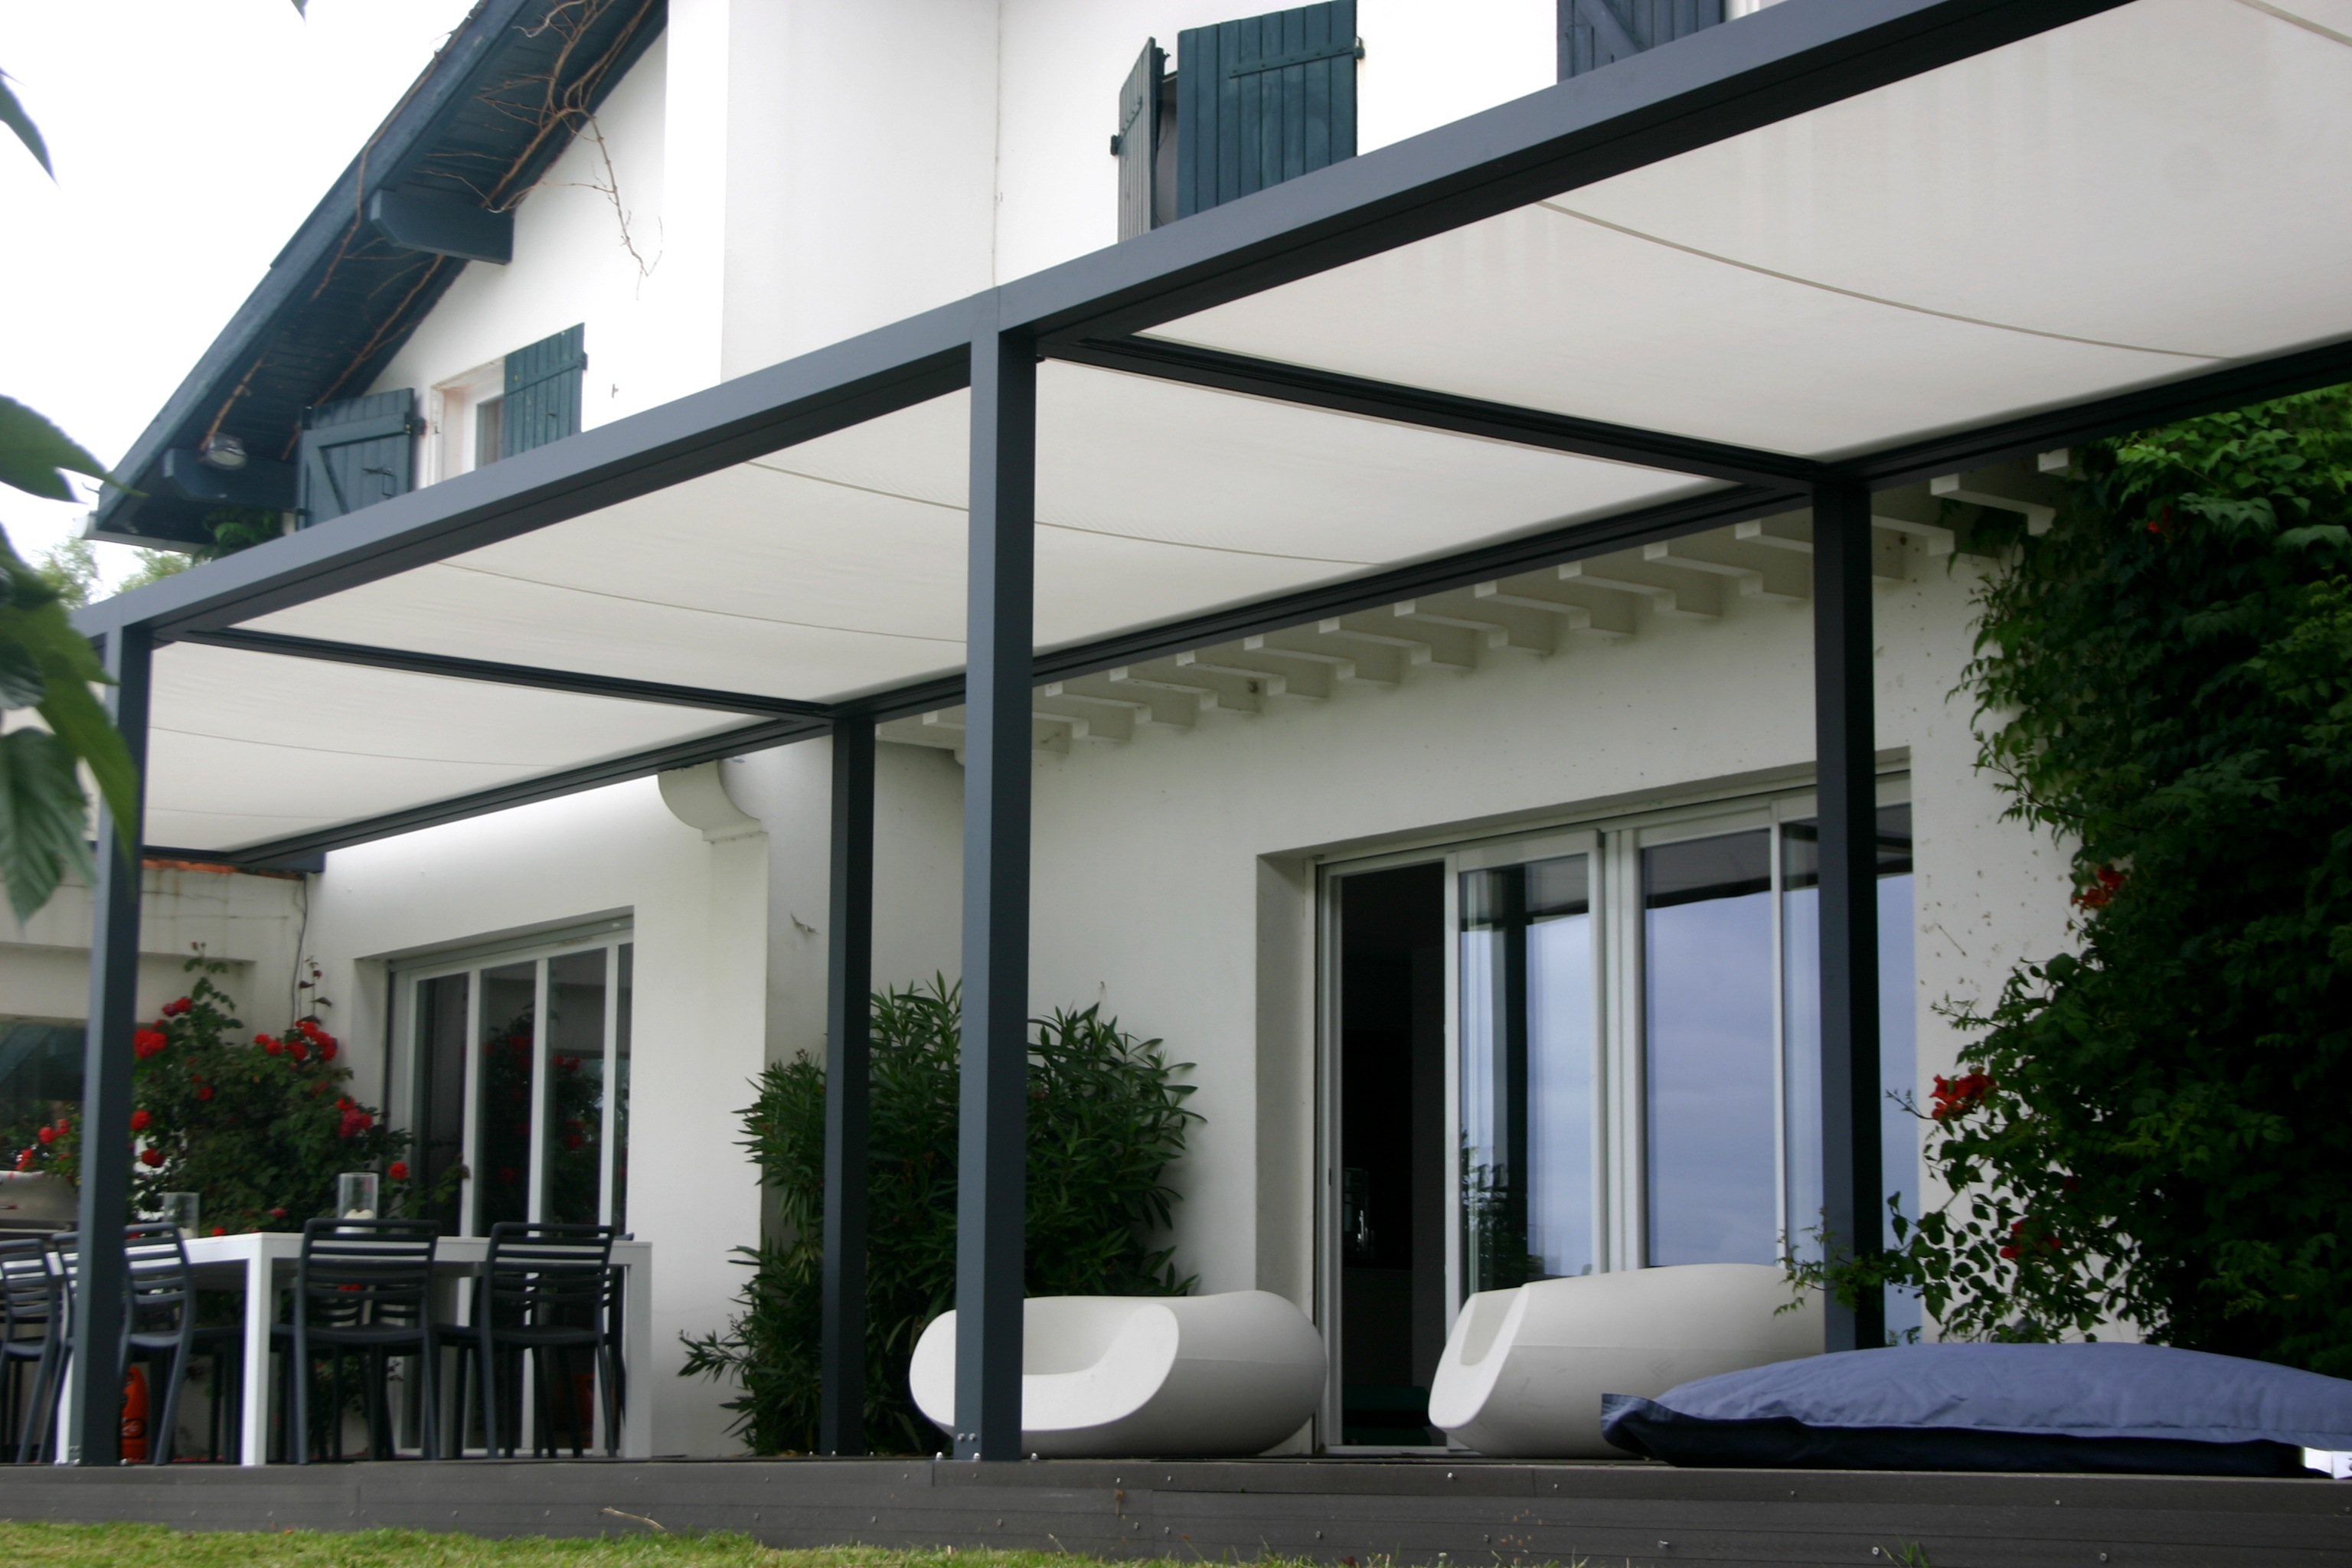 ID2 design - ideea terrasse